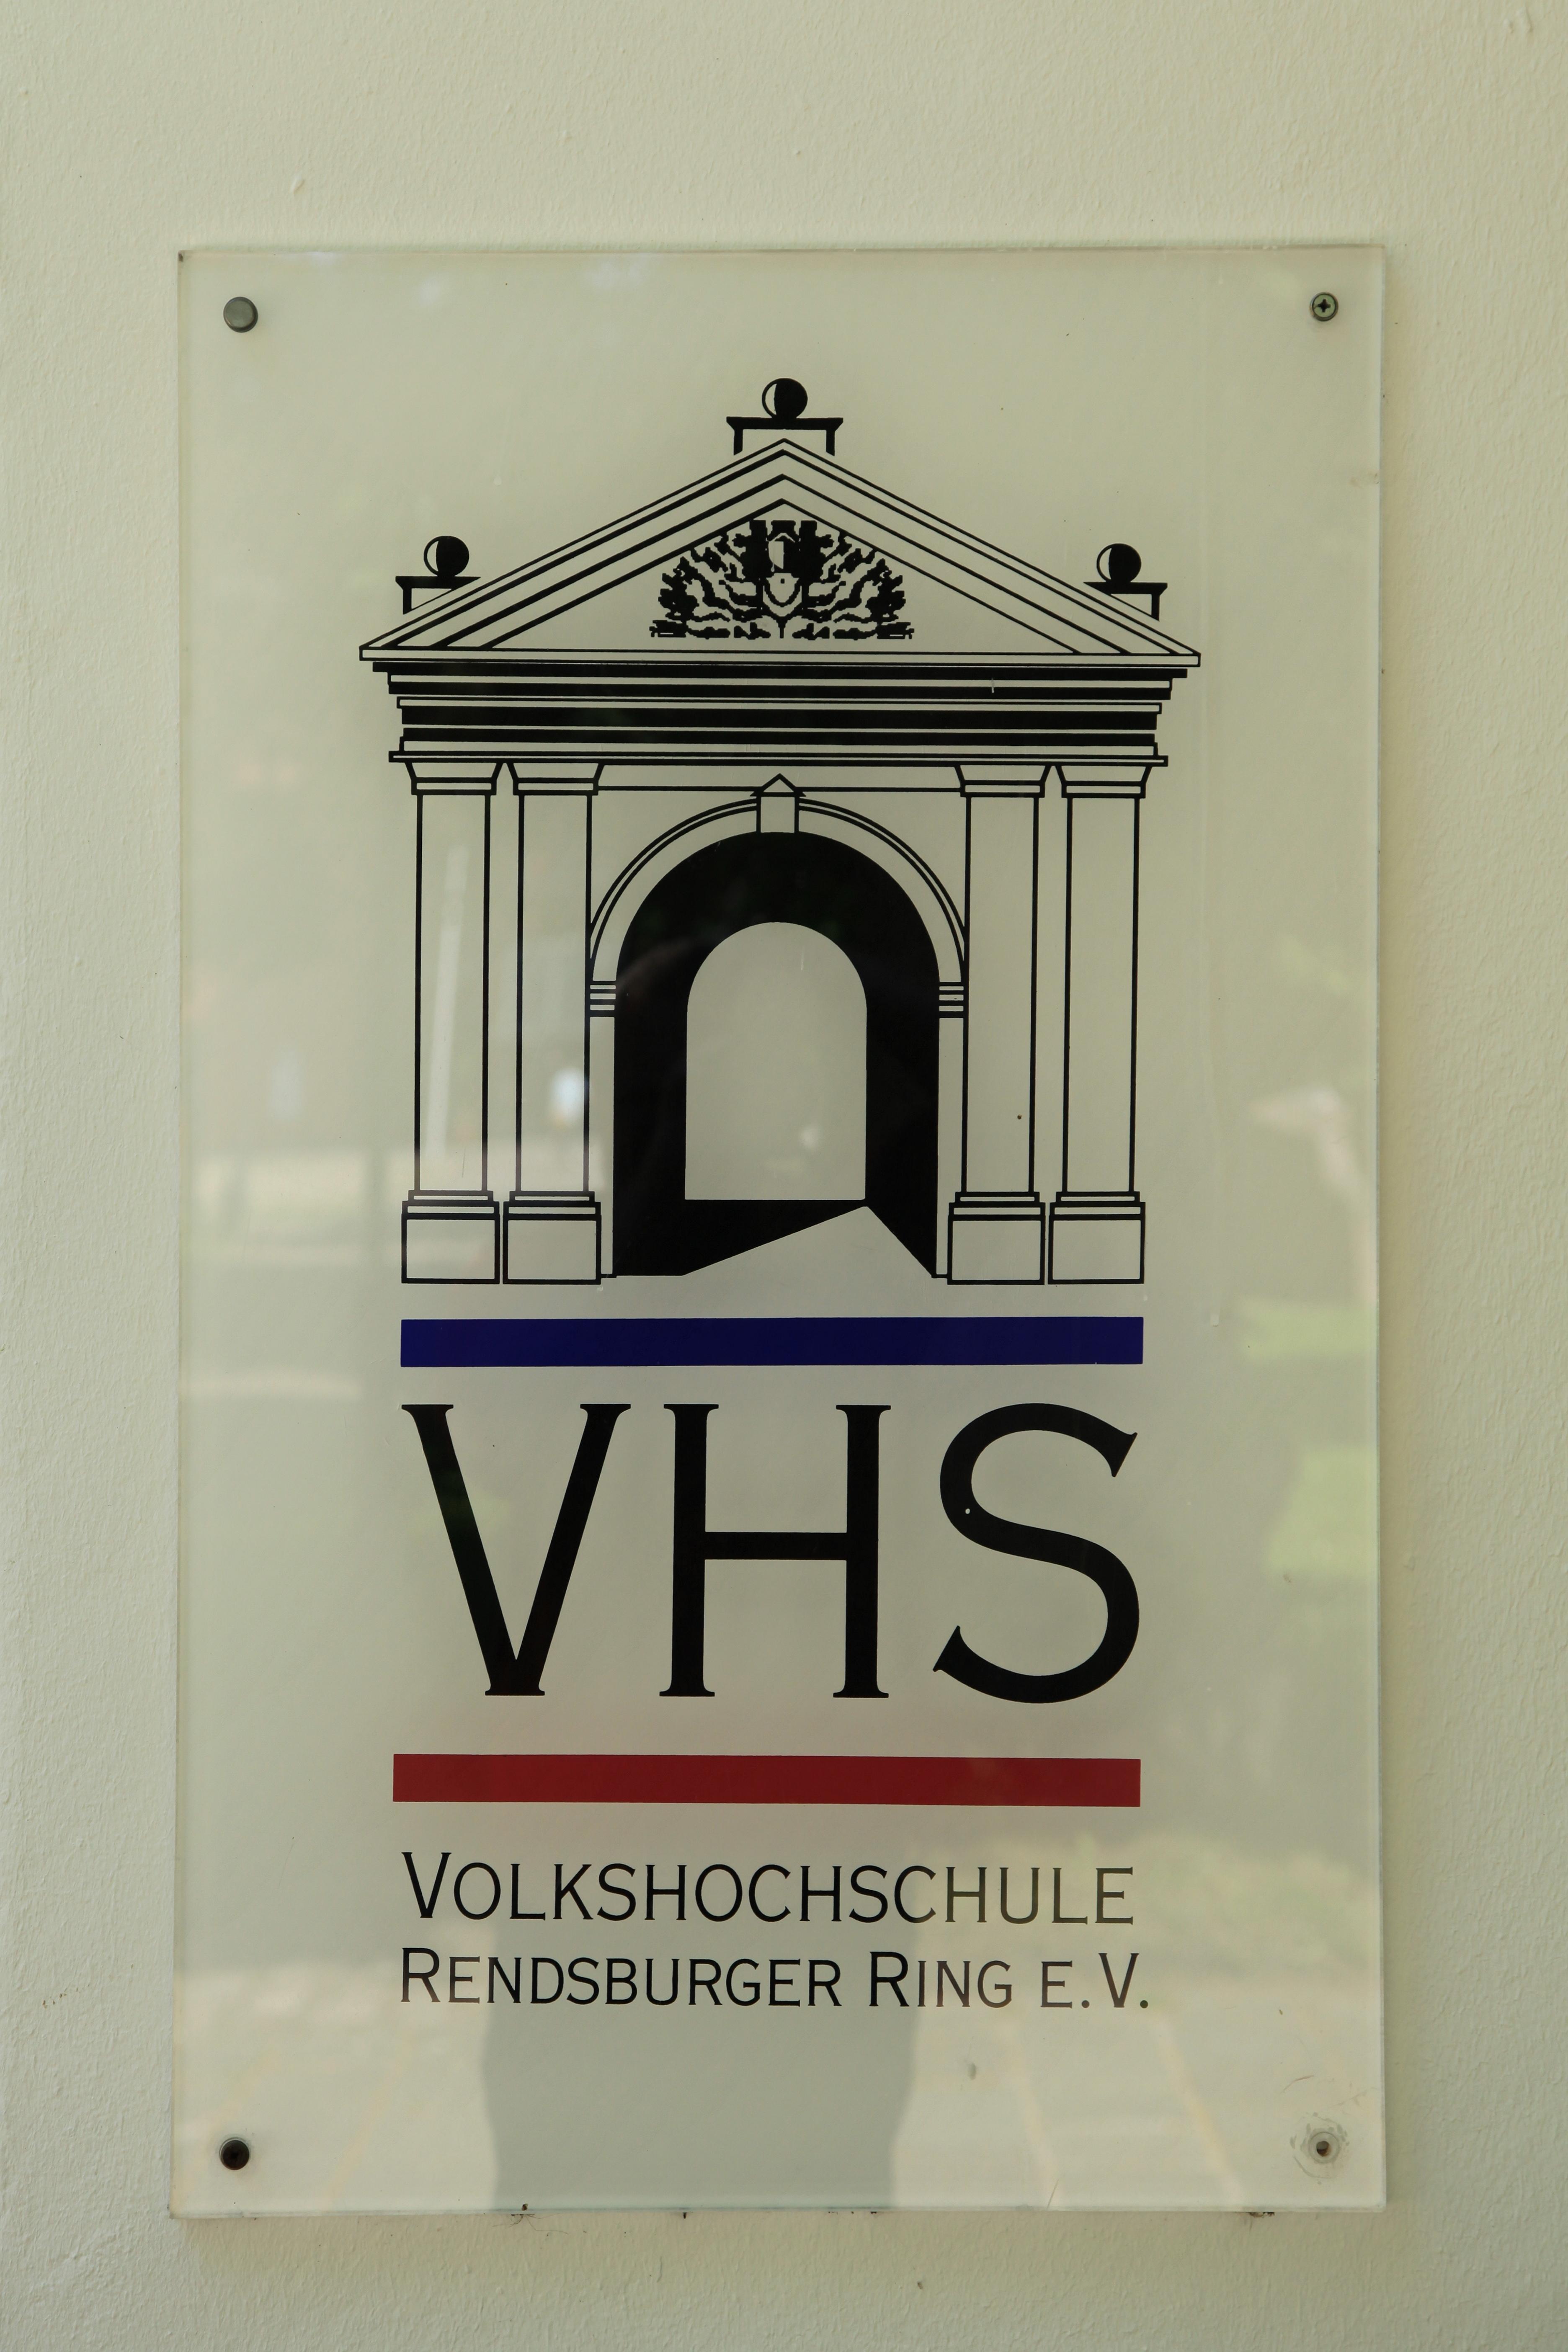 volkshochschule rendsburg